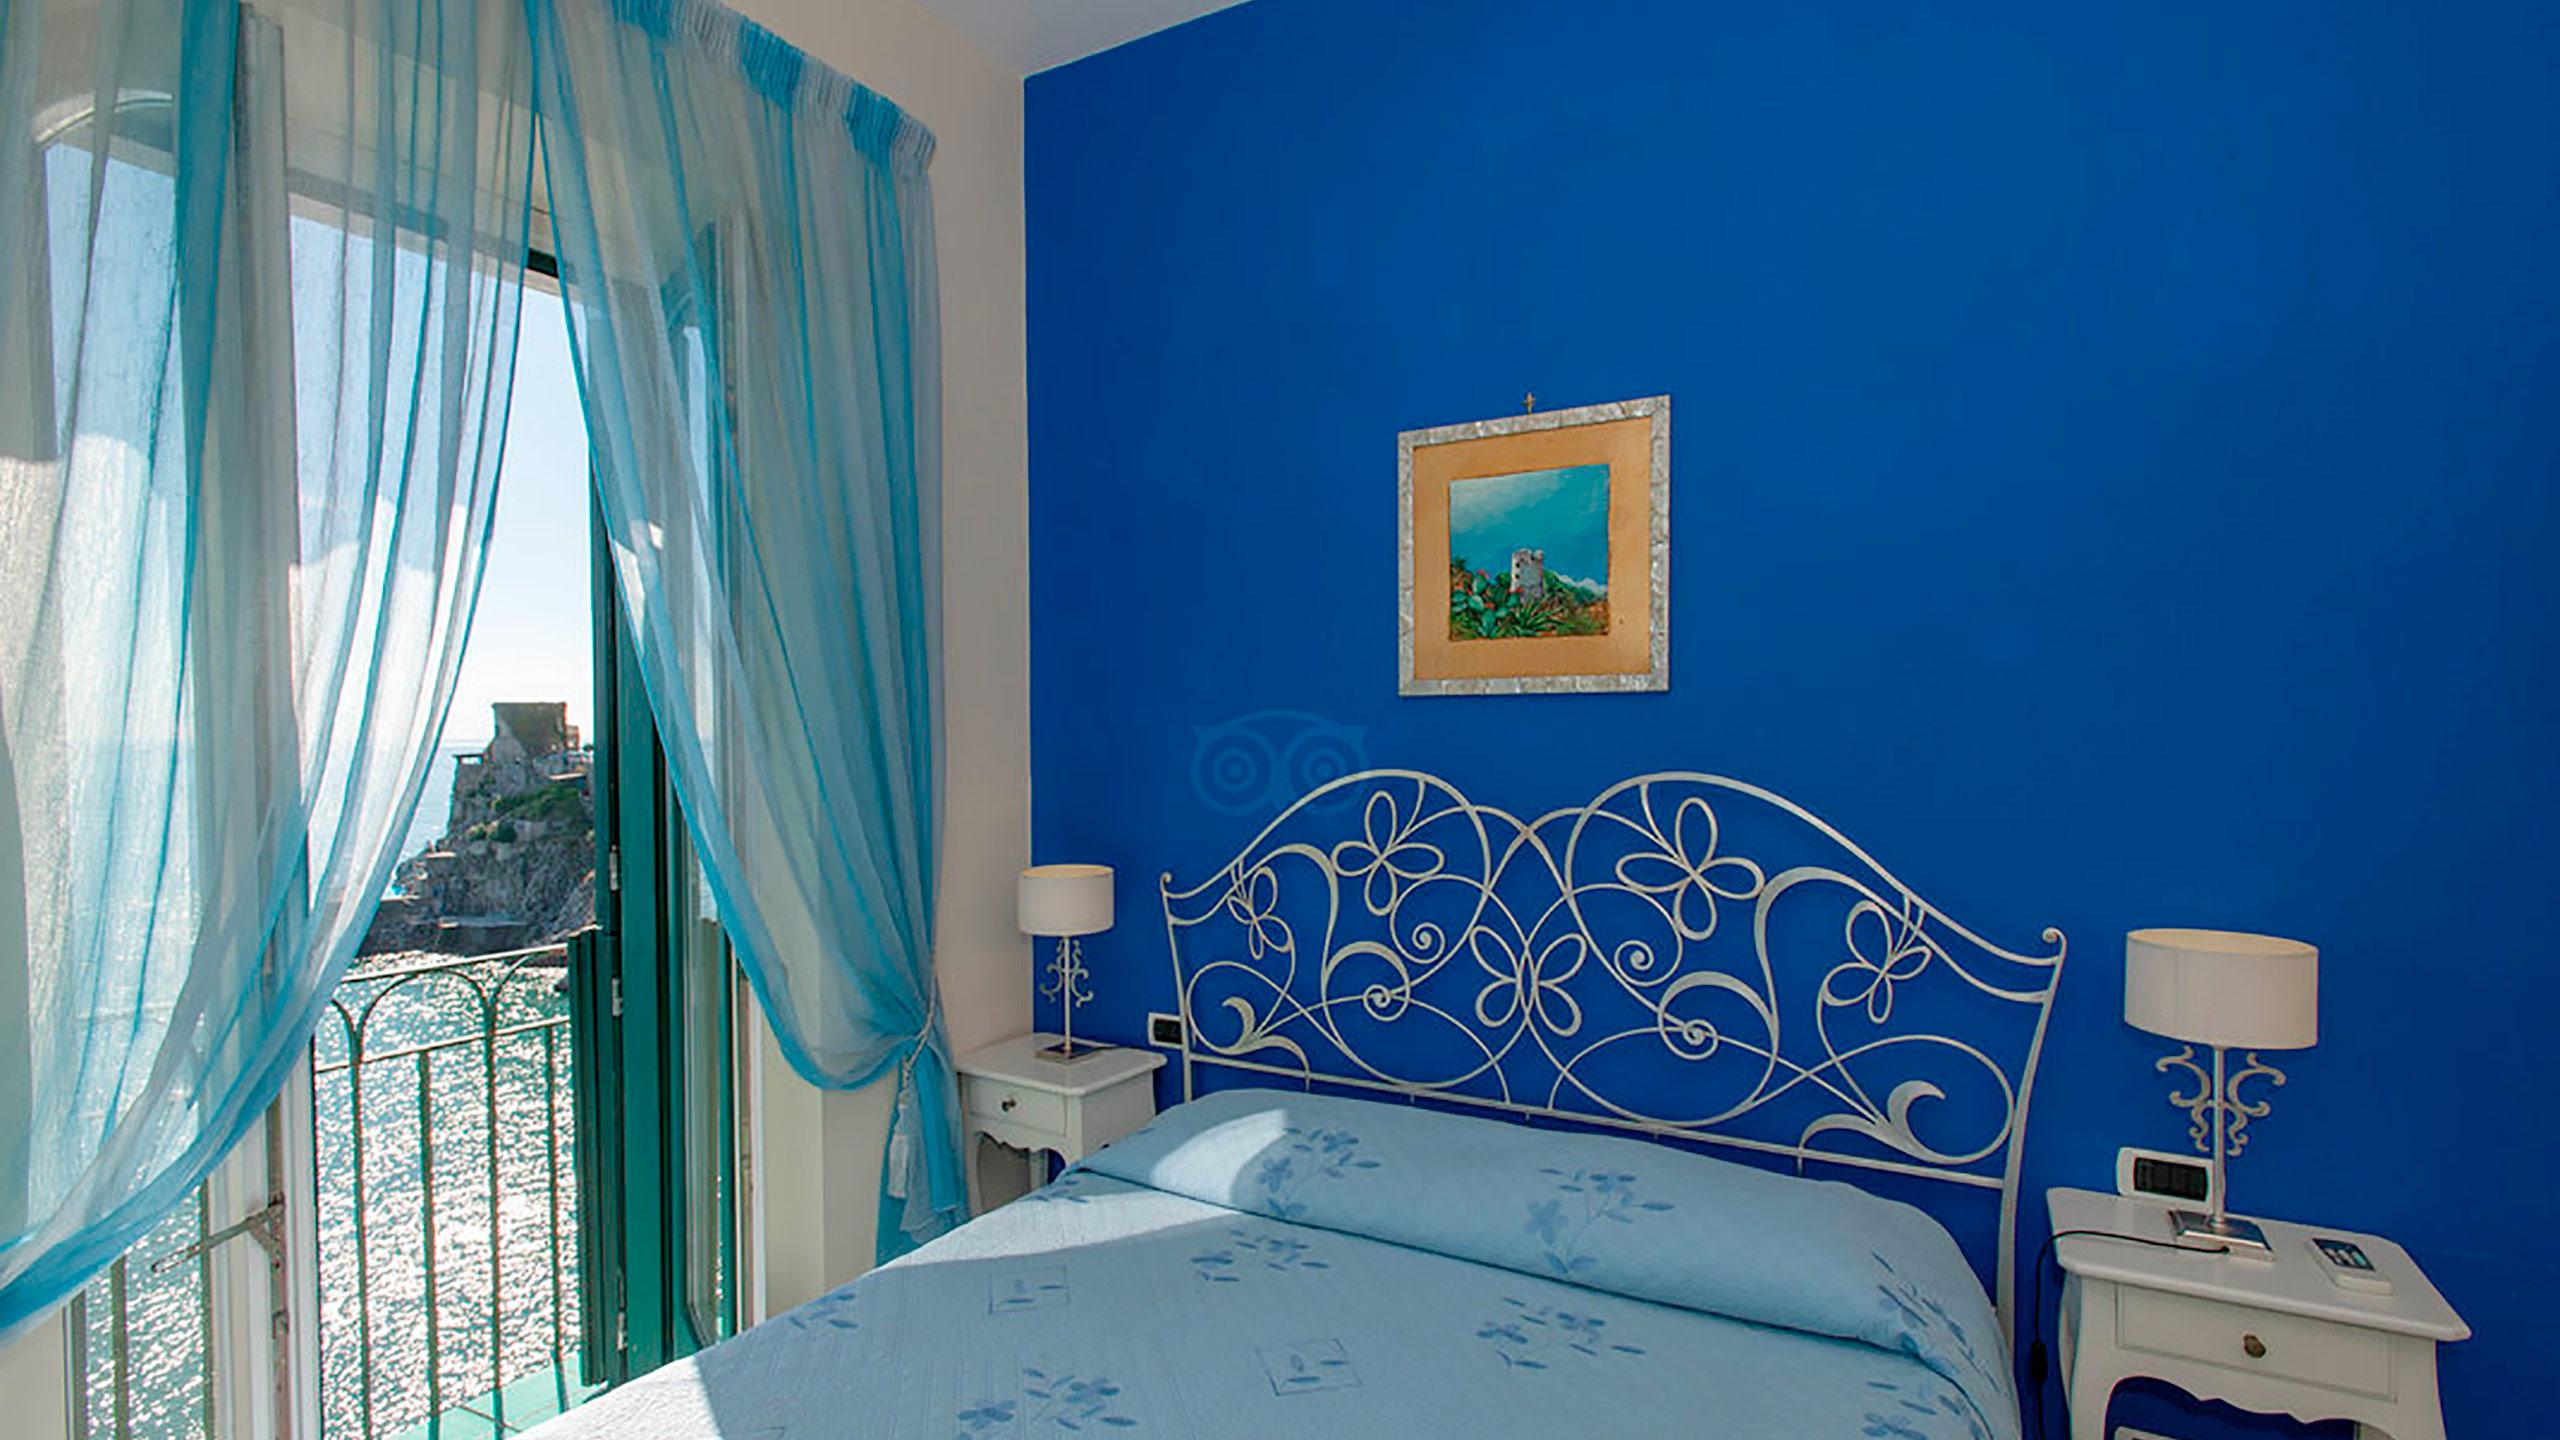 la-rondine-room--v10056879